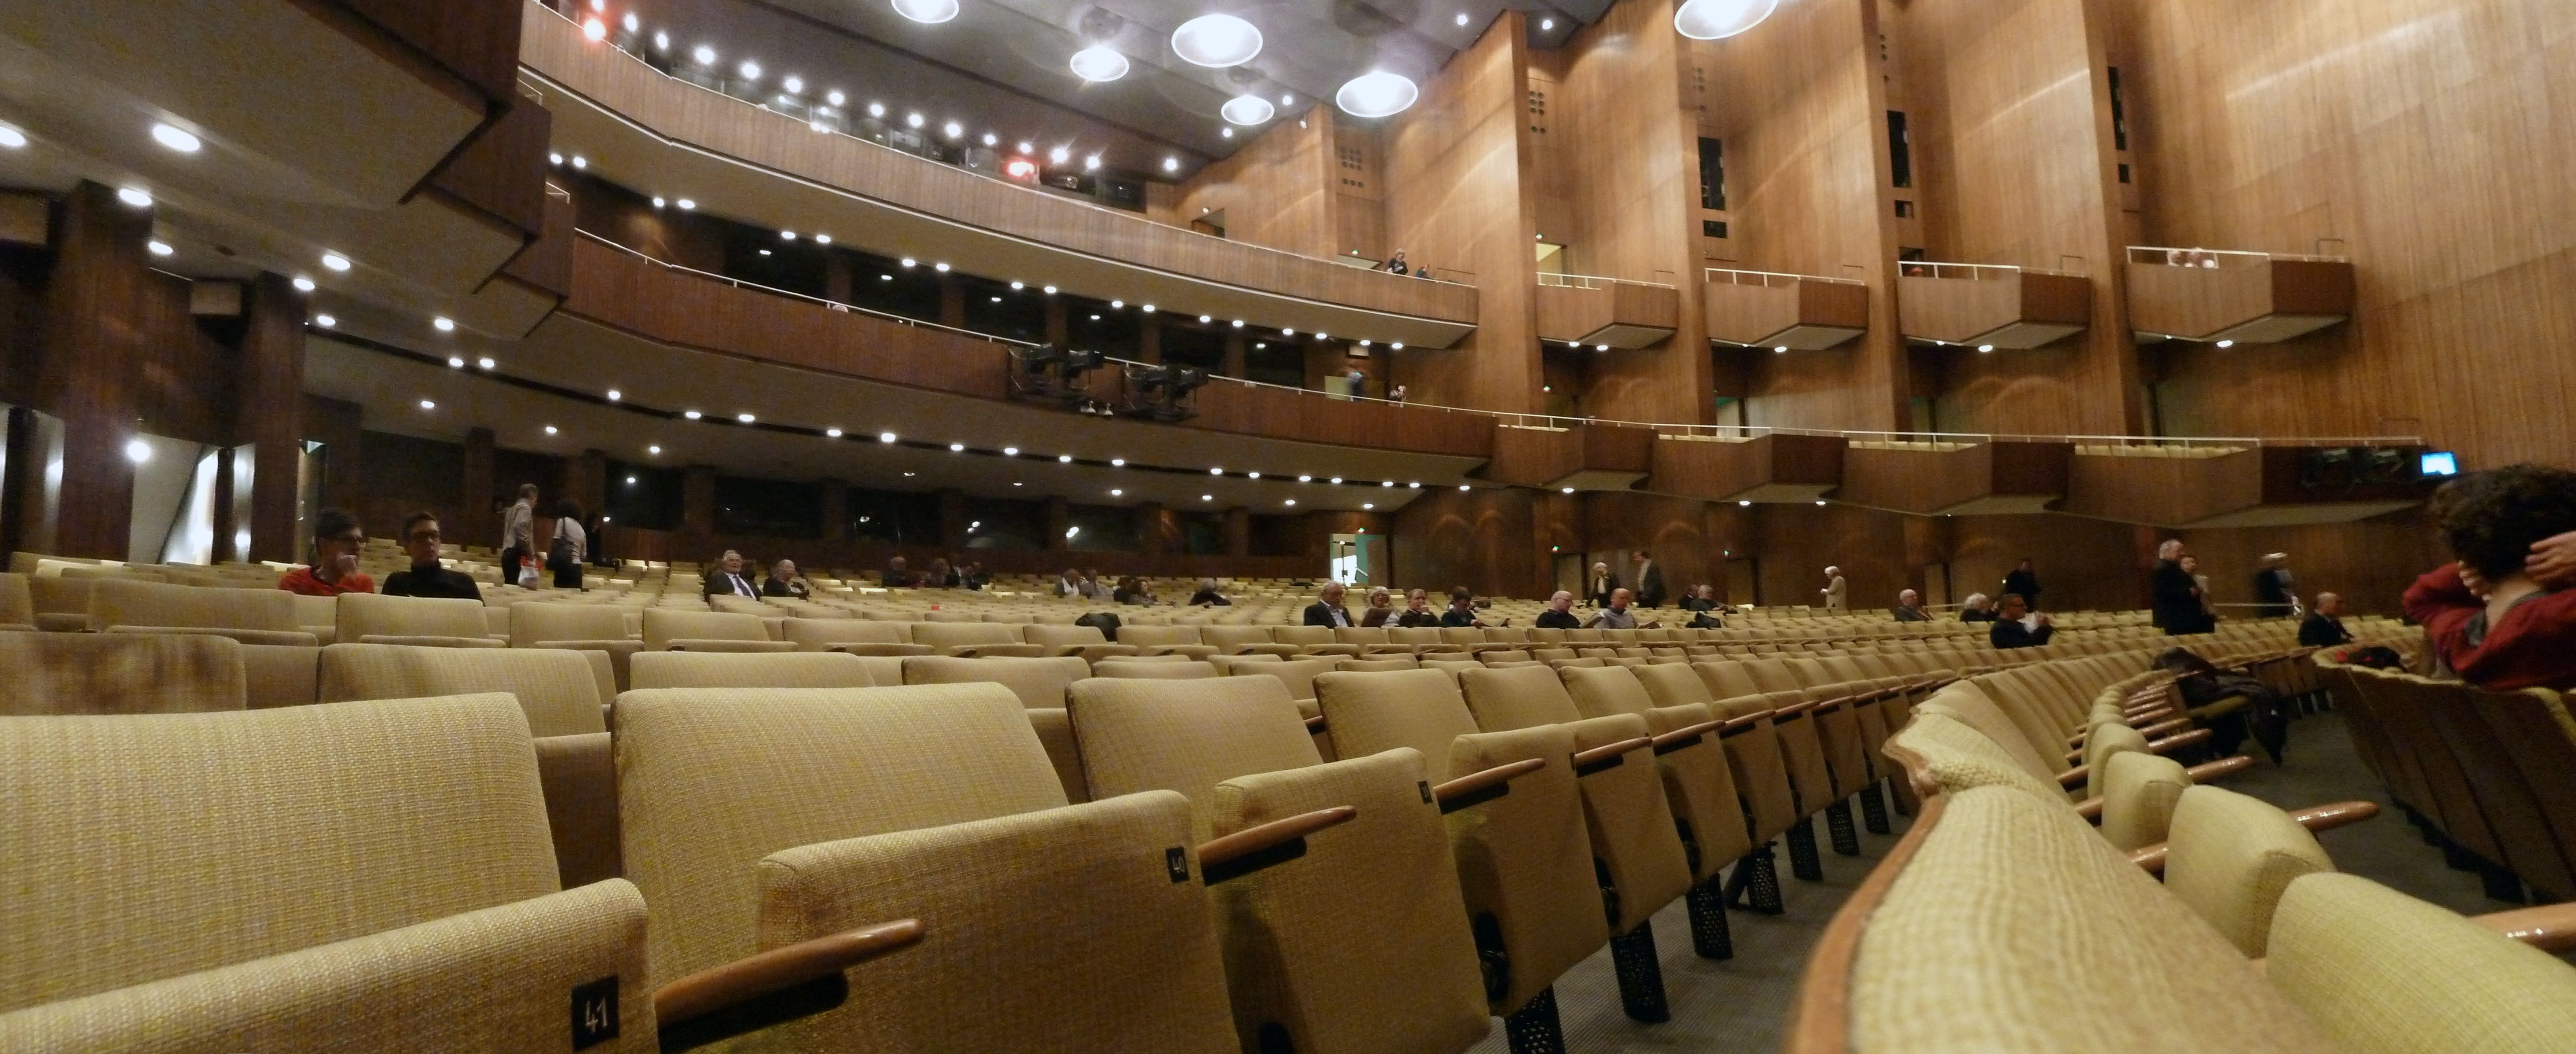 Moderne Oper